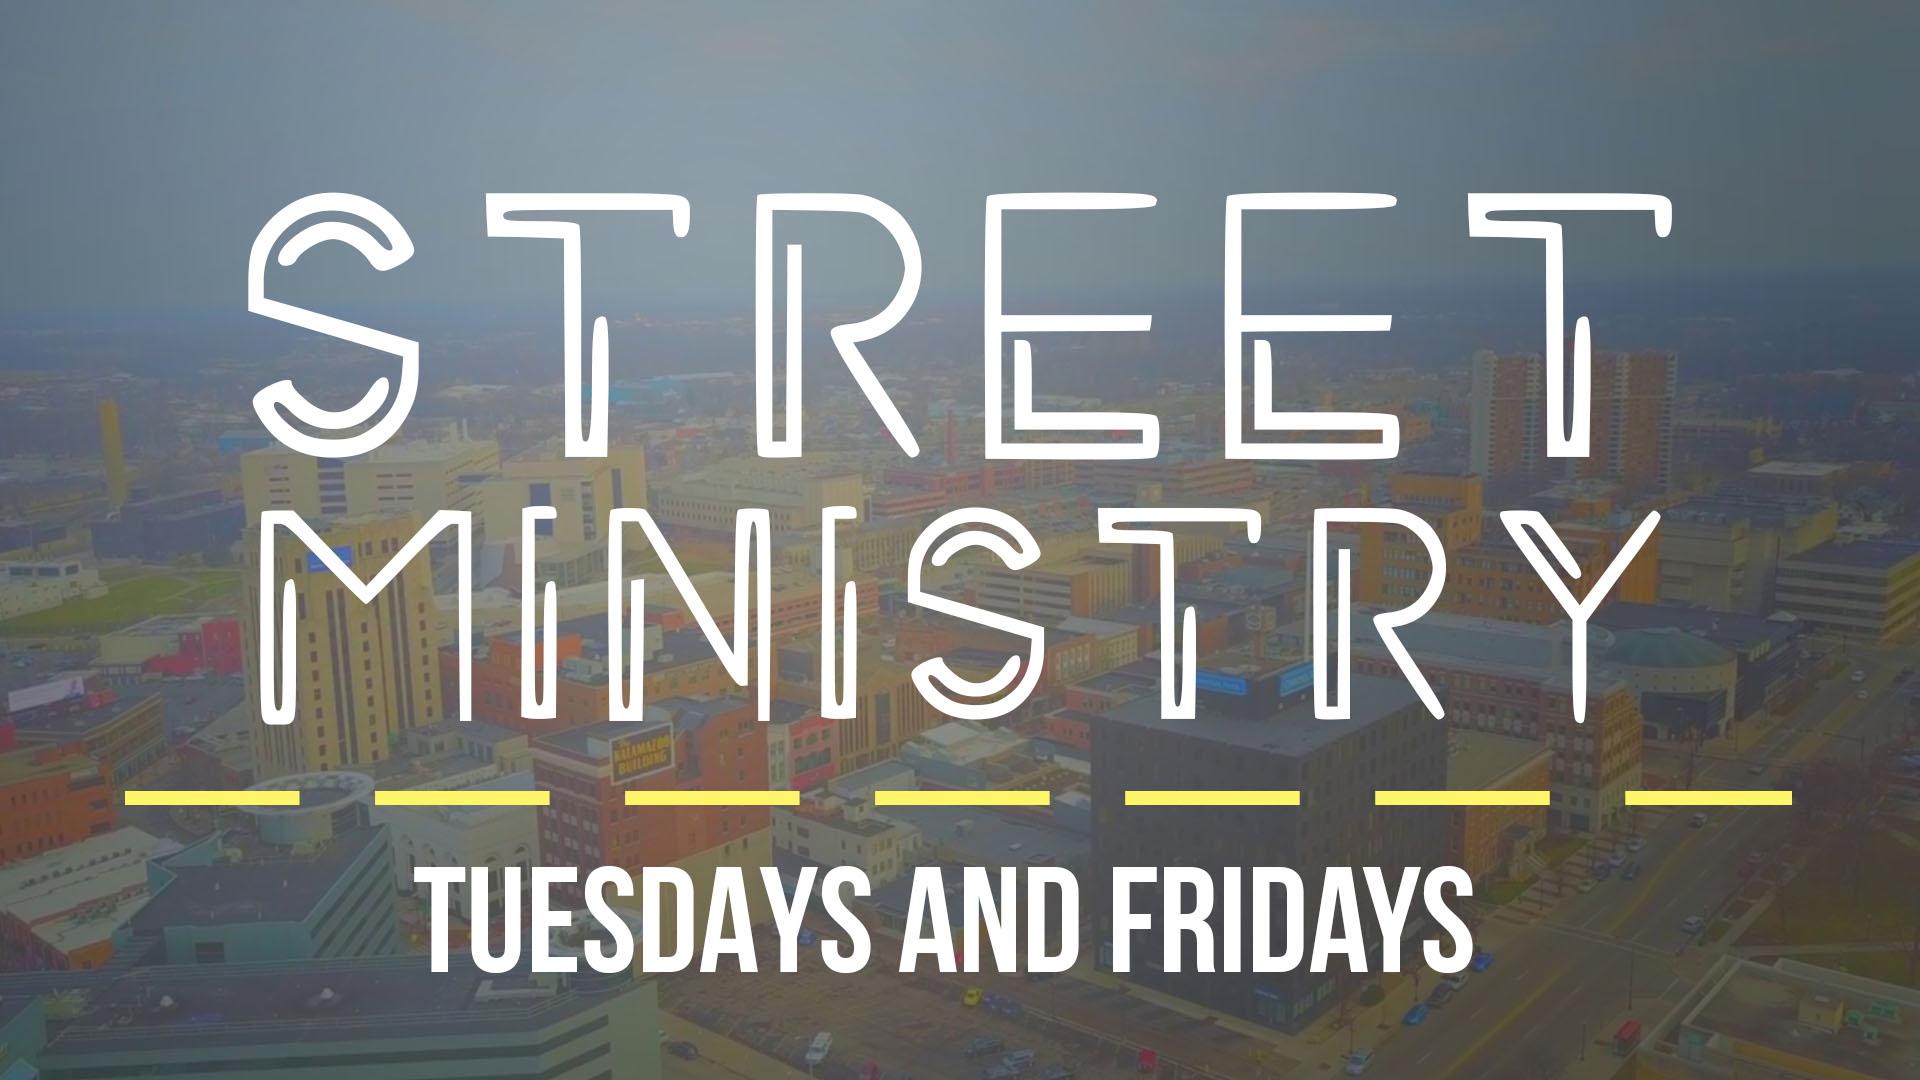 street ministry.jpg